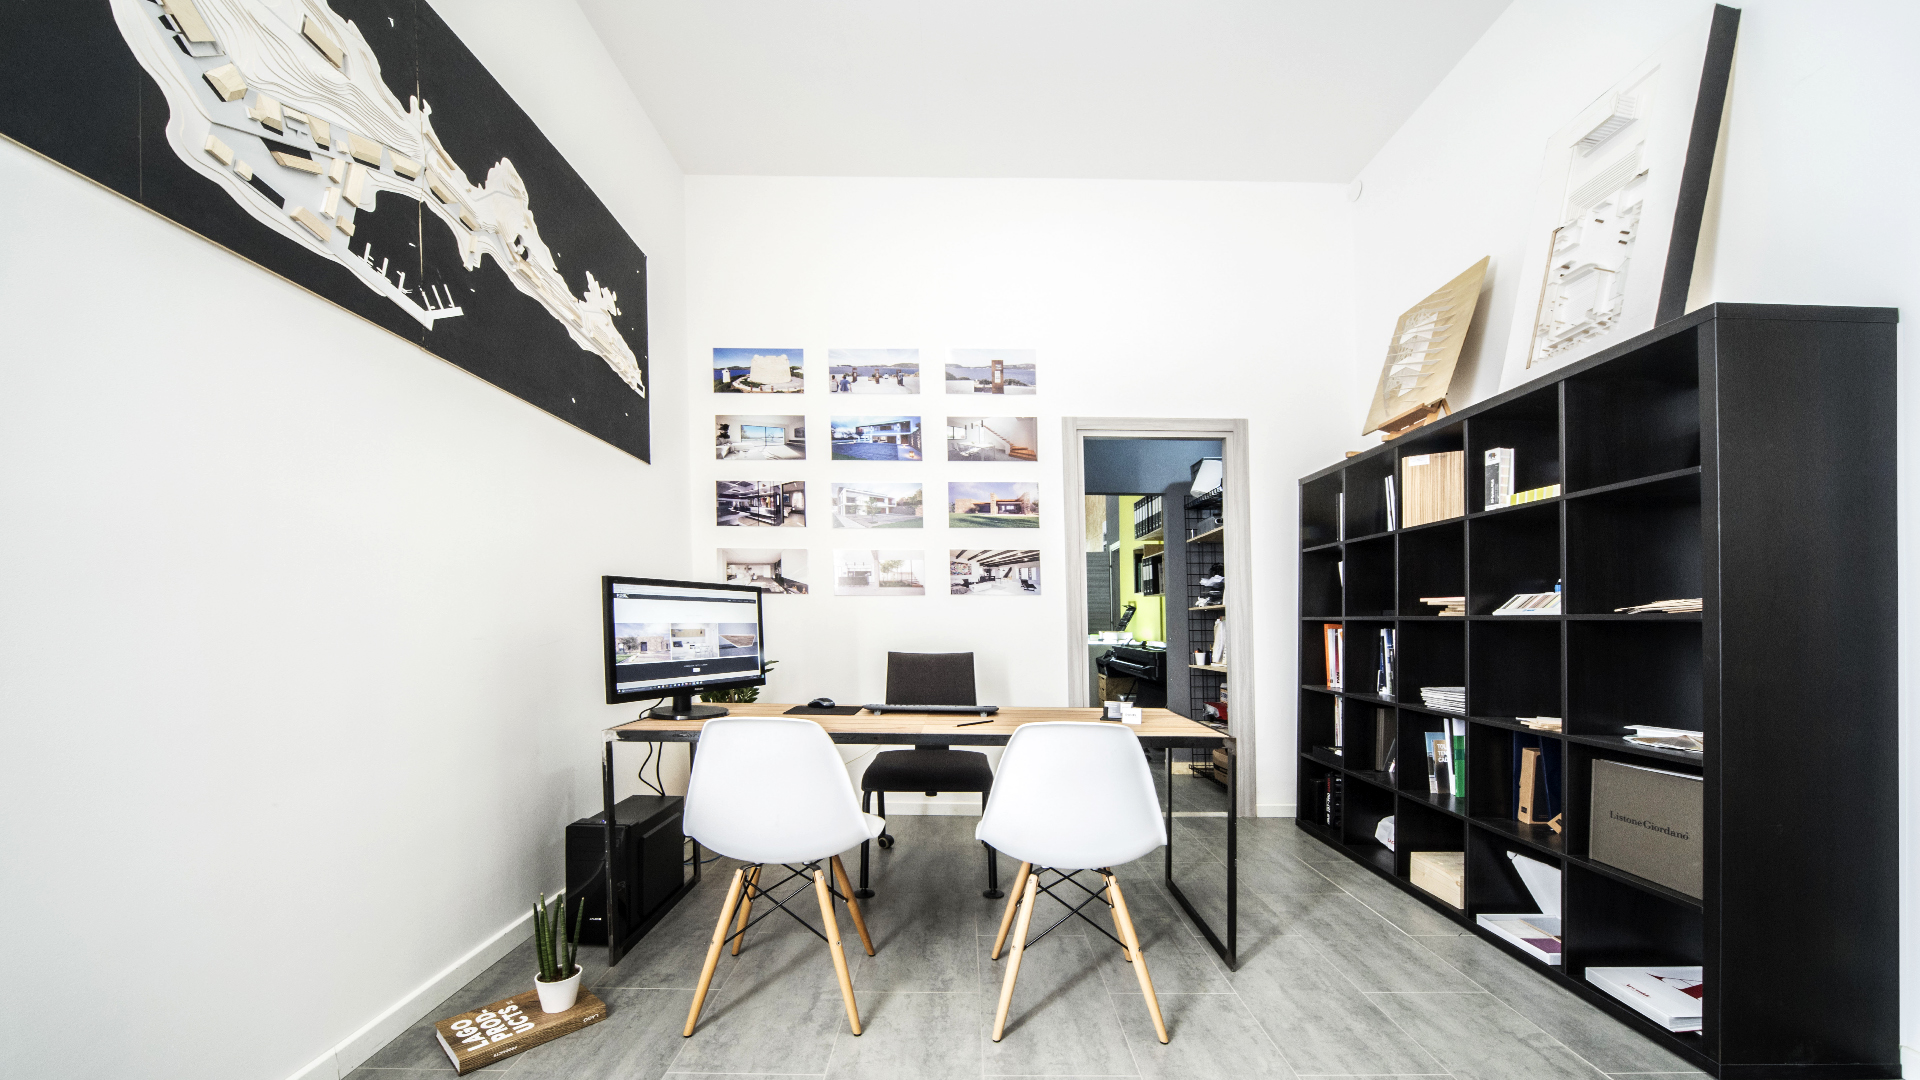 Studio architettura alghero Pixel (4)